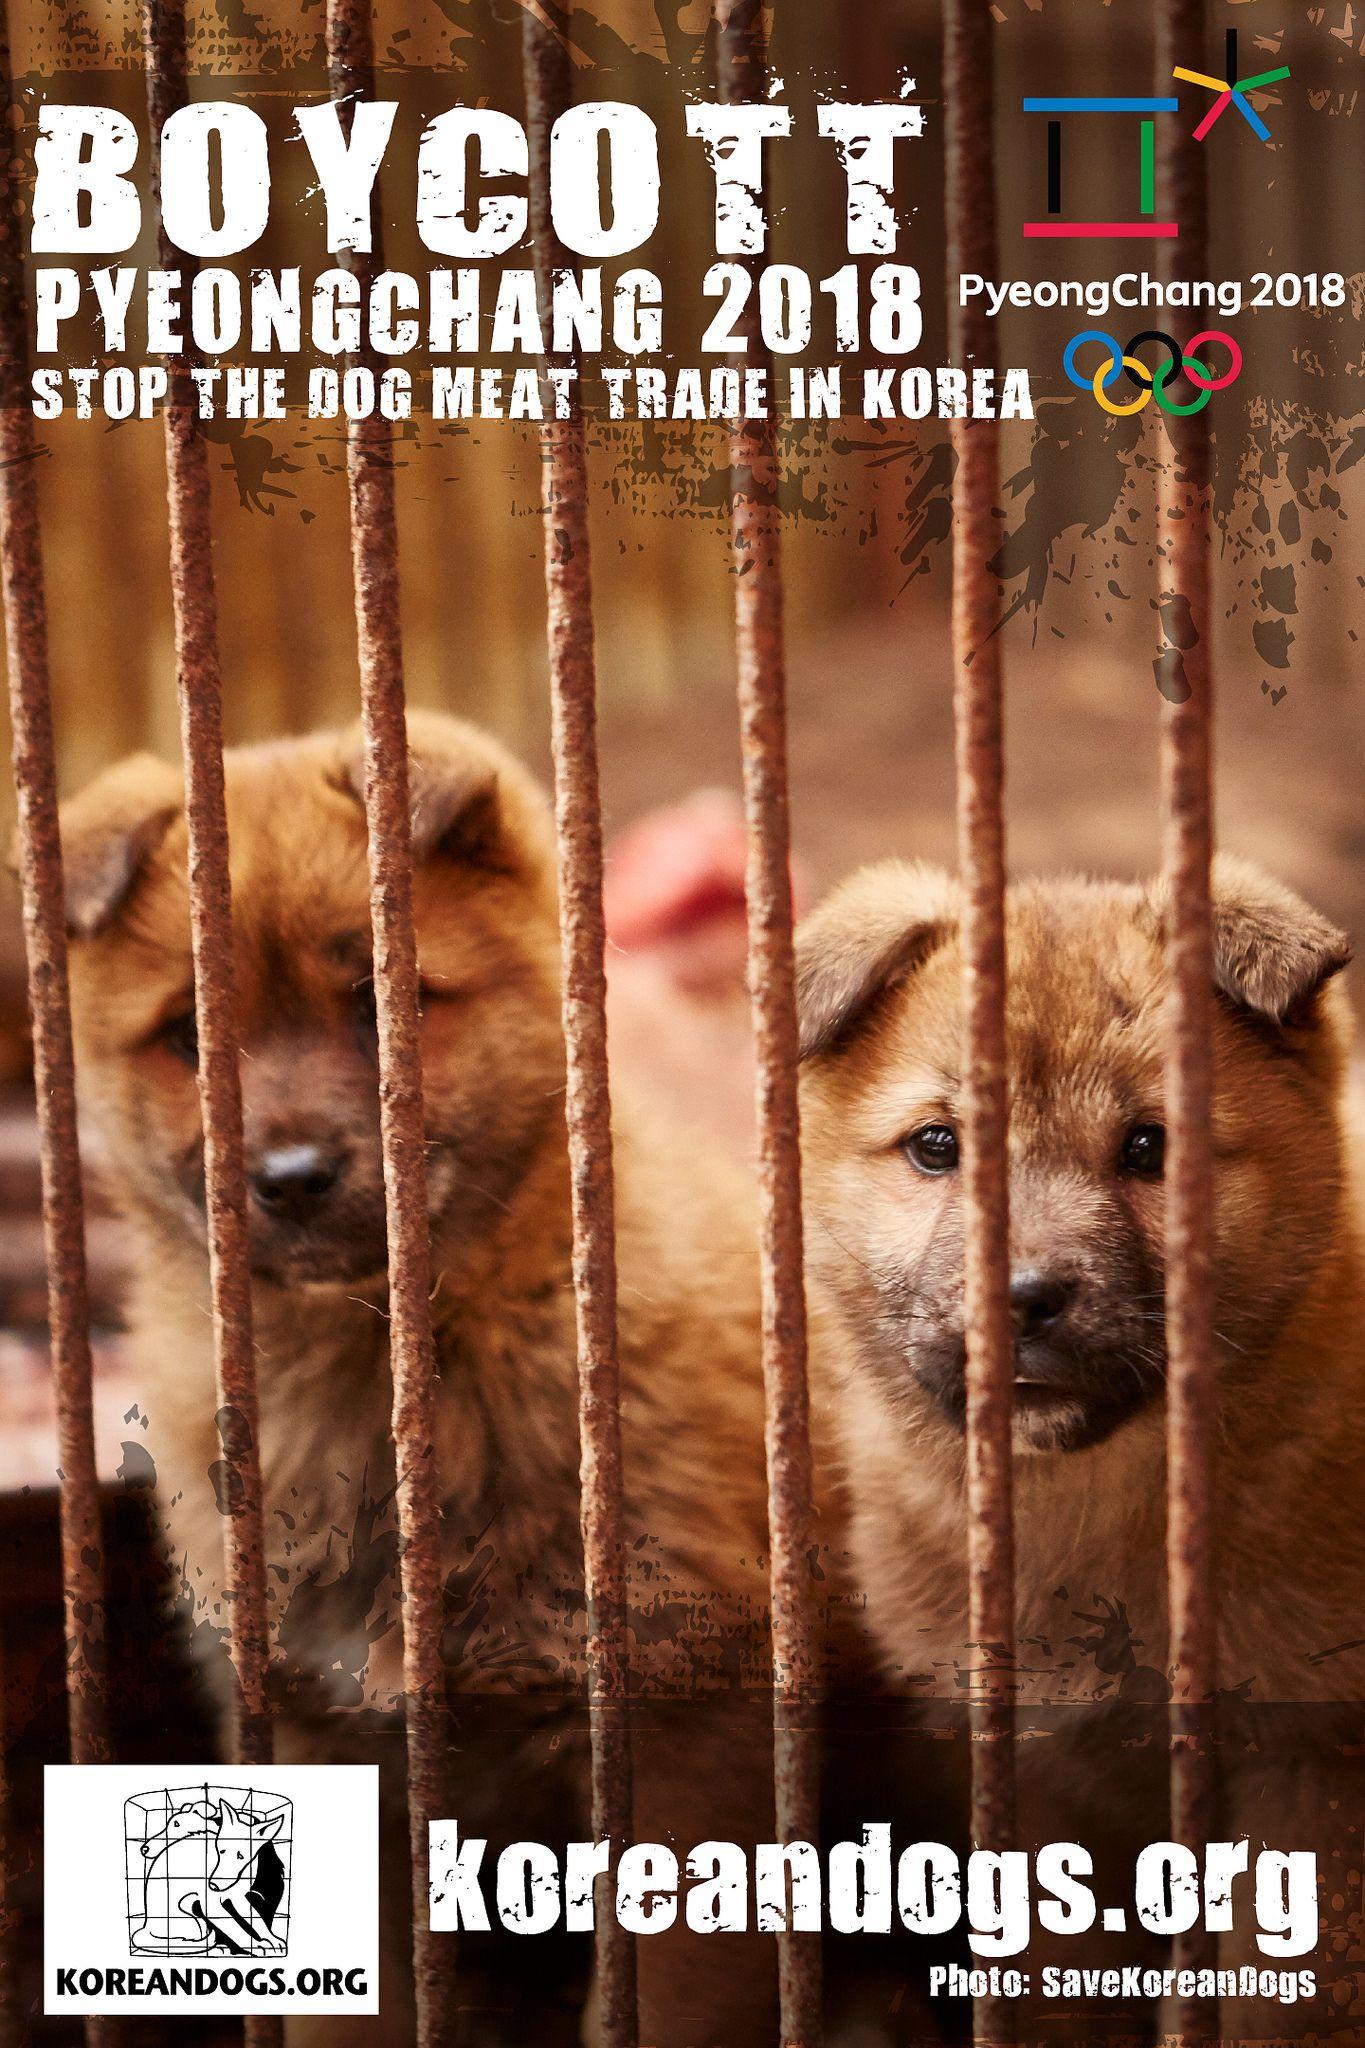 Boycott Pyeongchang 1440x2160 P With Images